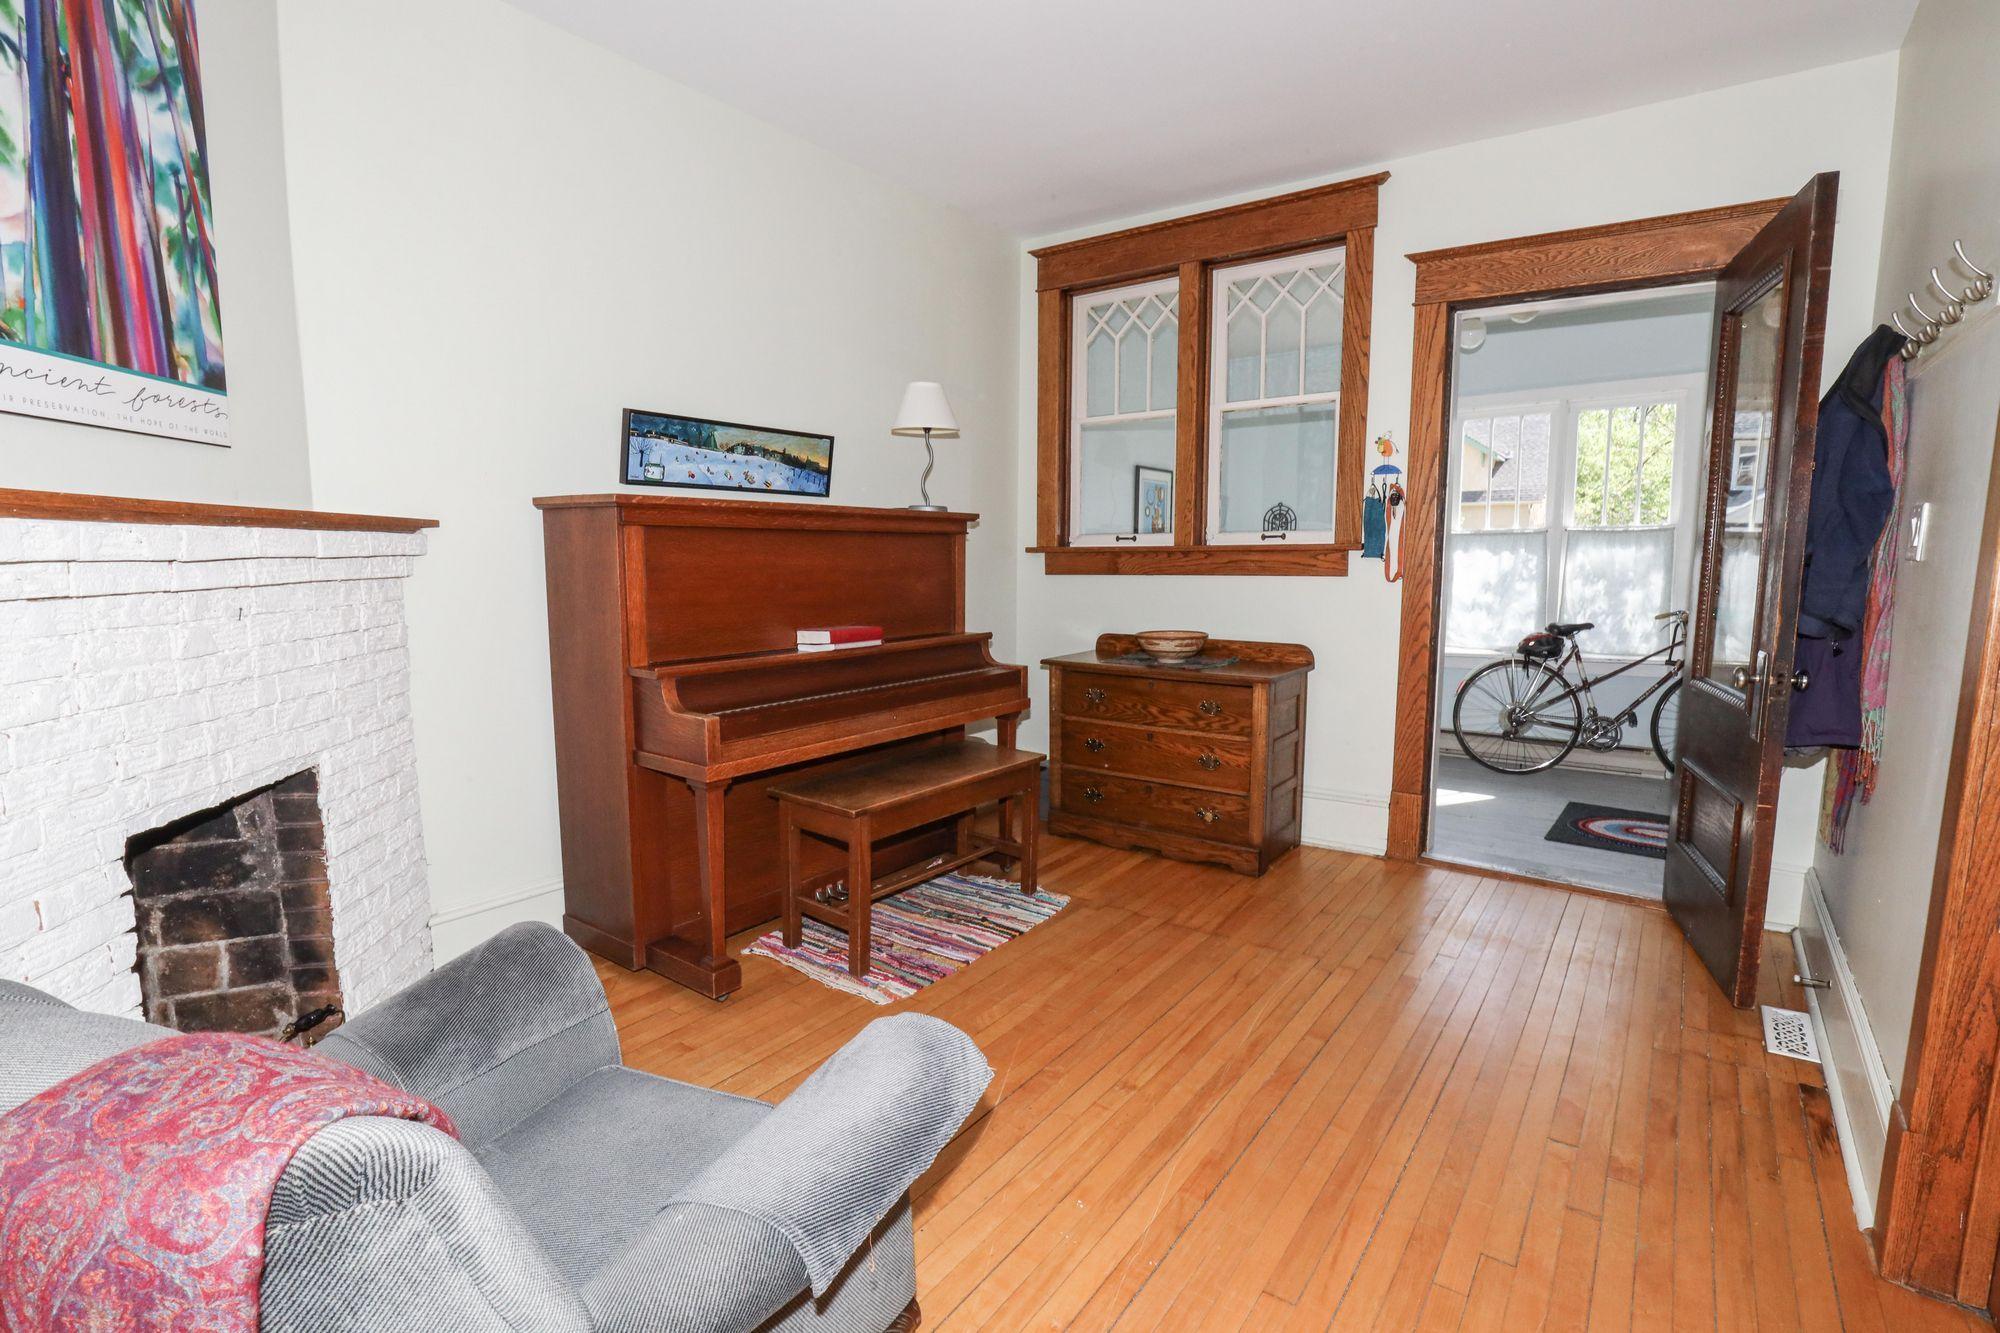 Photo 5: Photos: 110 Lipton in Winnipeg: Wolseley Single Family Detached for sale (5B)  : MLS®# 202111593